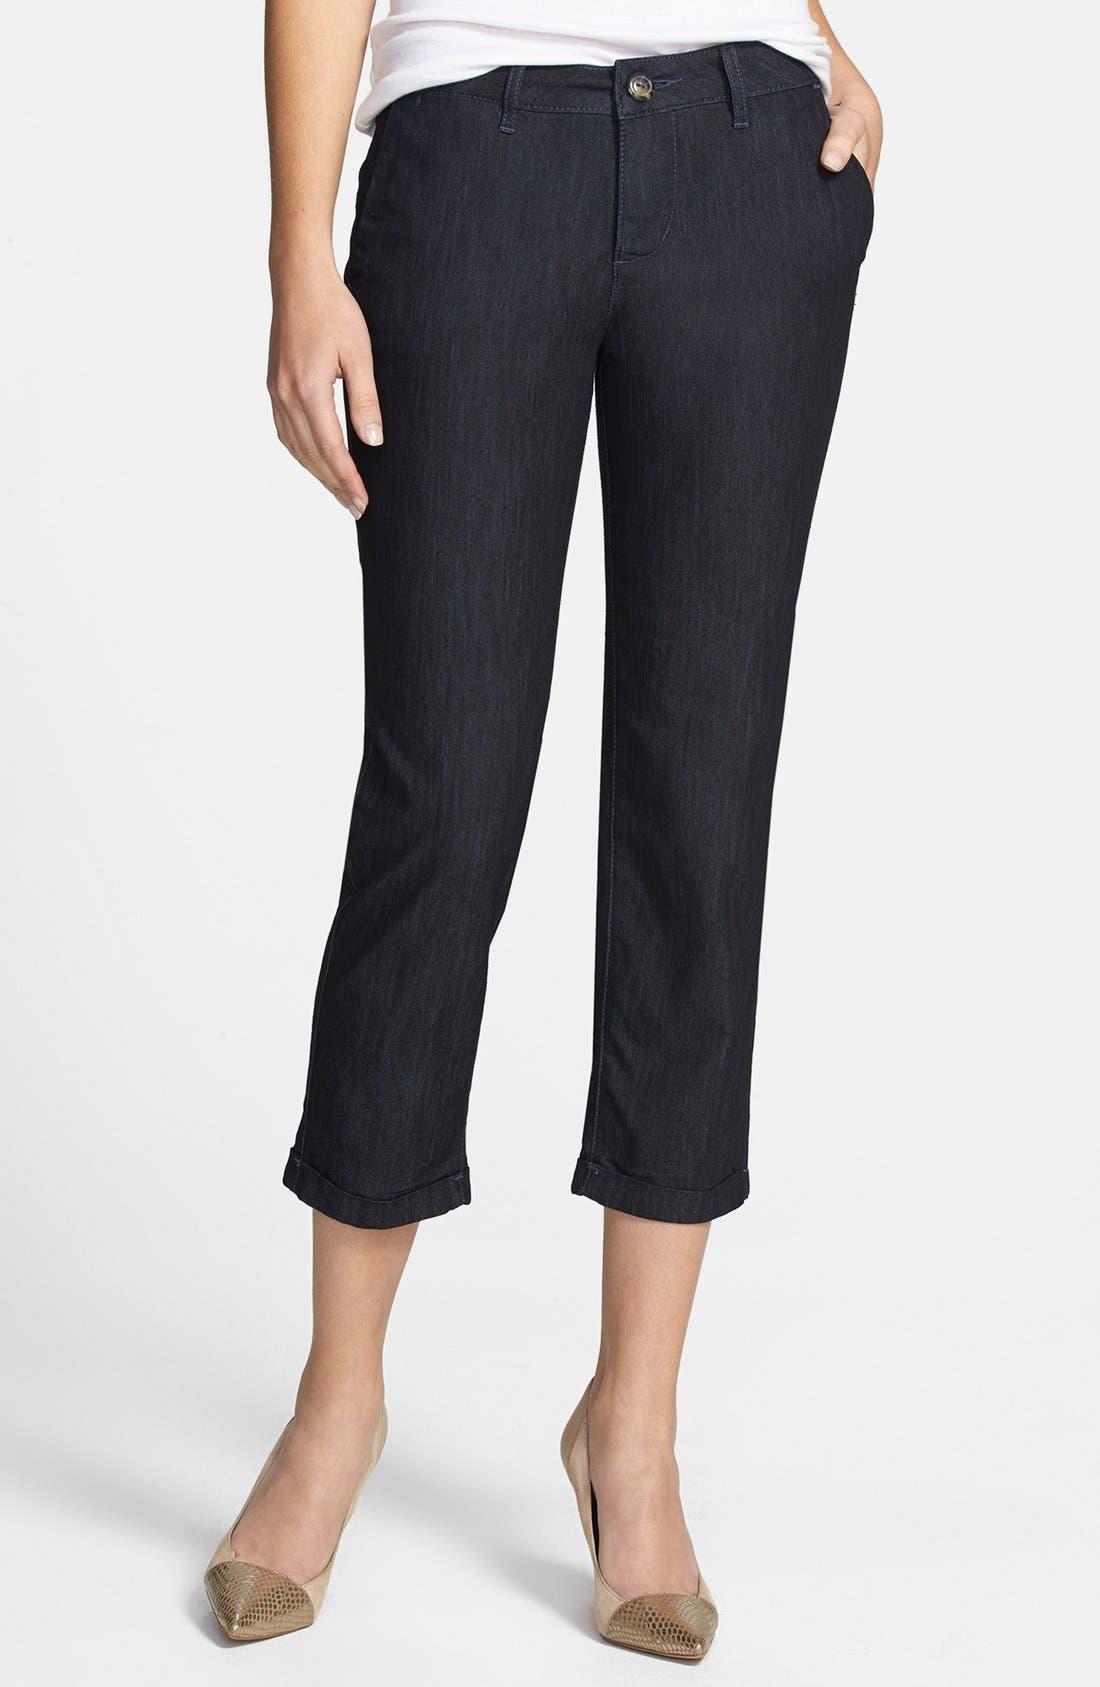 Alternate Image 1 Selected - Jag Jeans 'Cora' Stretch Crop Slim Leg Jeans (Dark Storm)